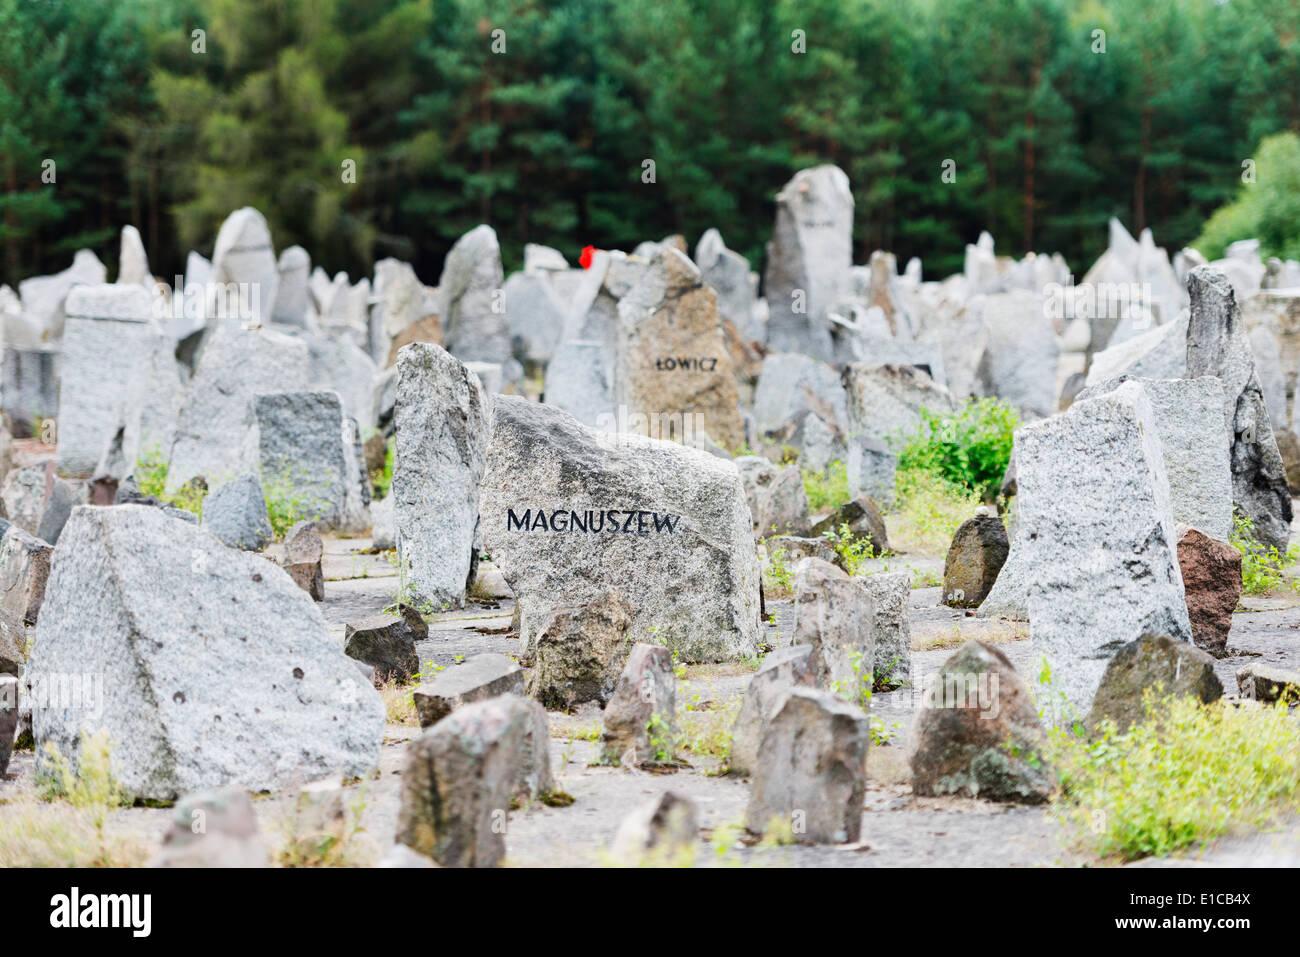 Europe, Poland, Treblinka extermination camp, World War II memorial site - Stock Image